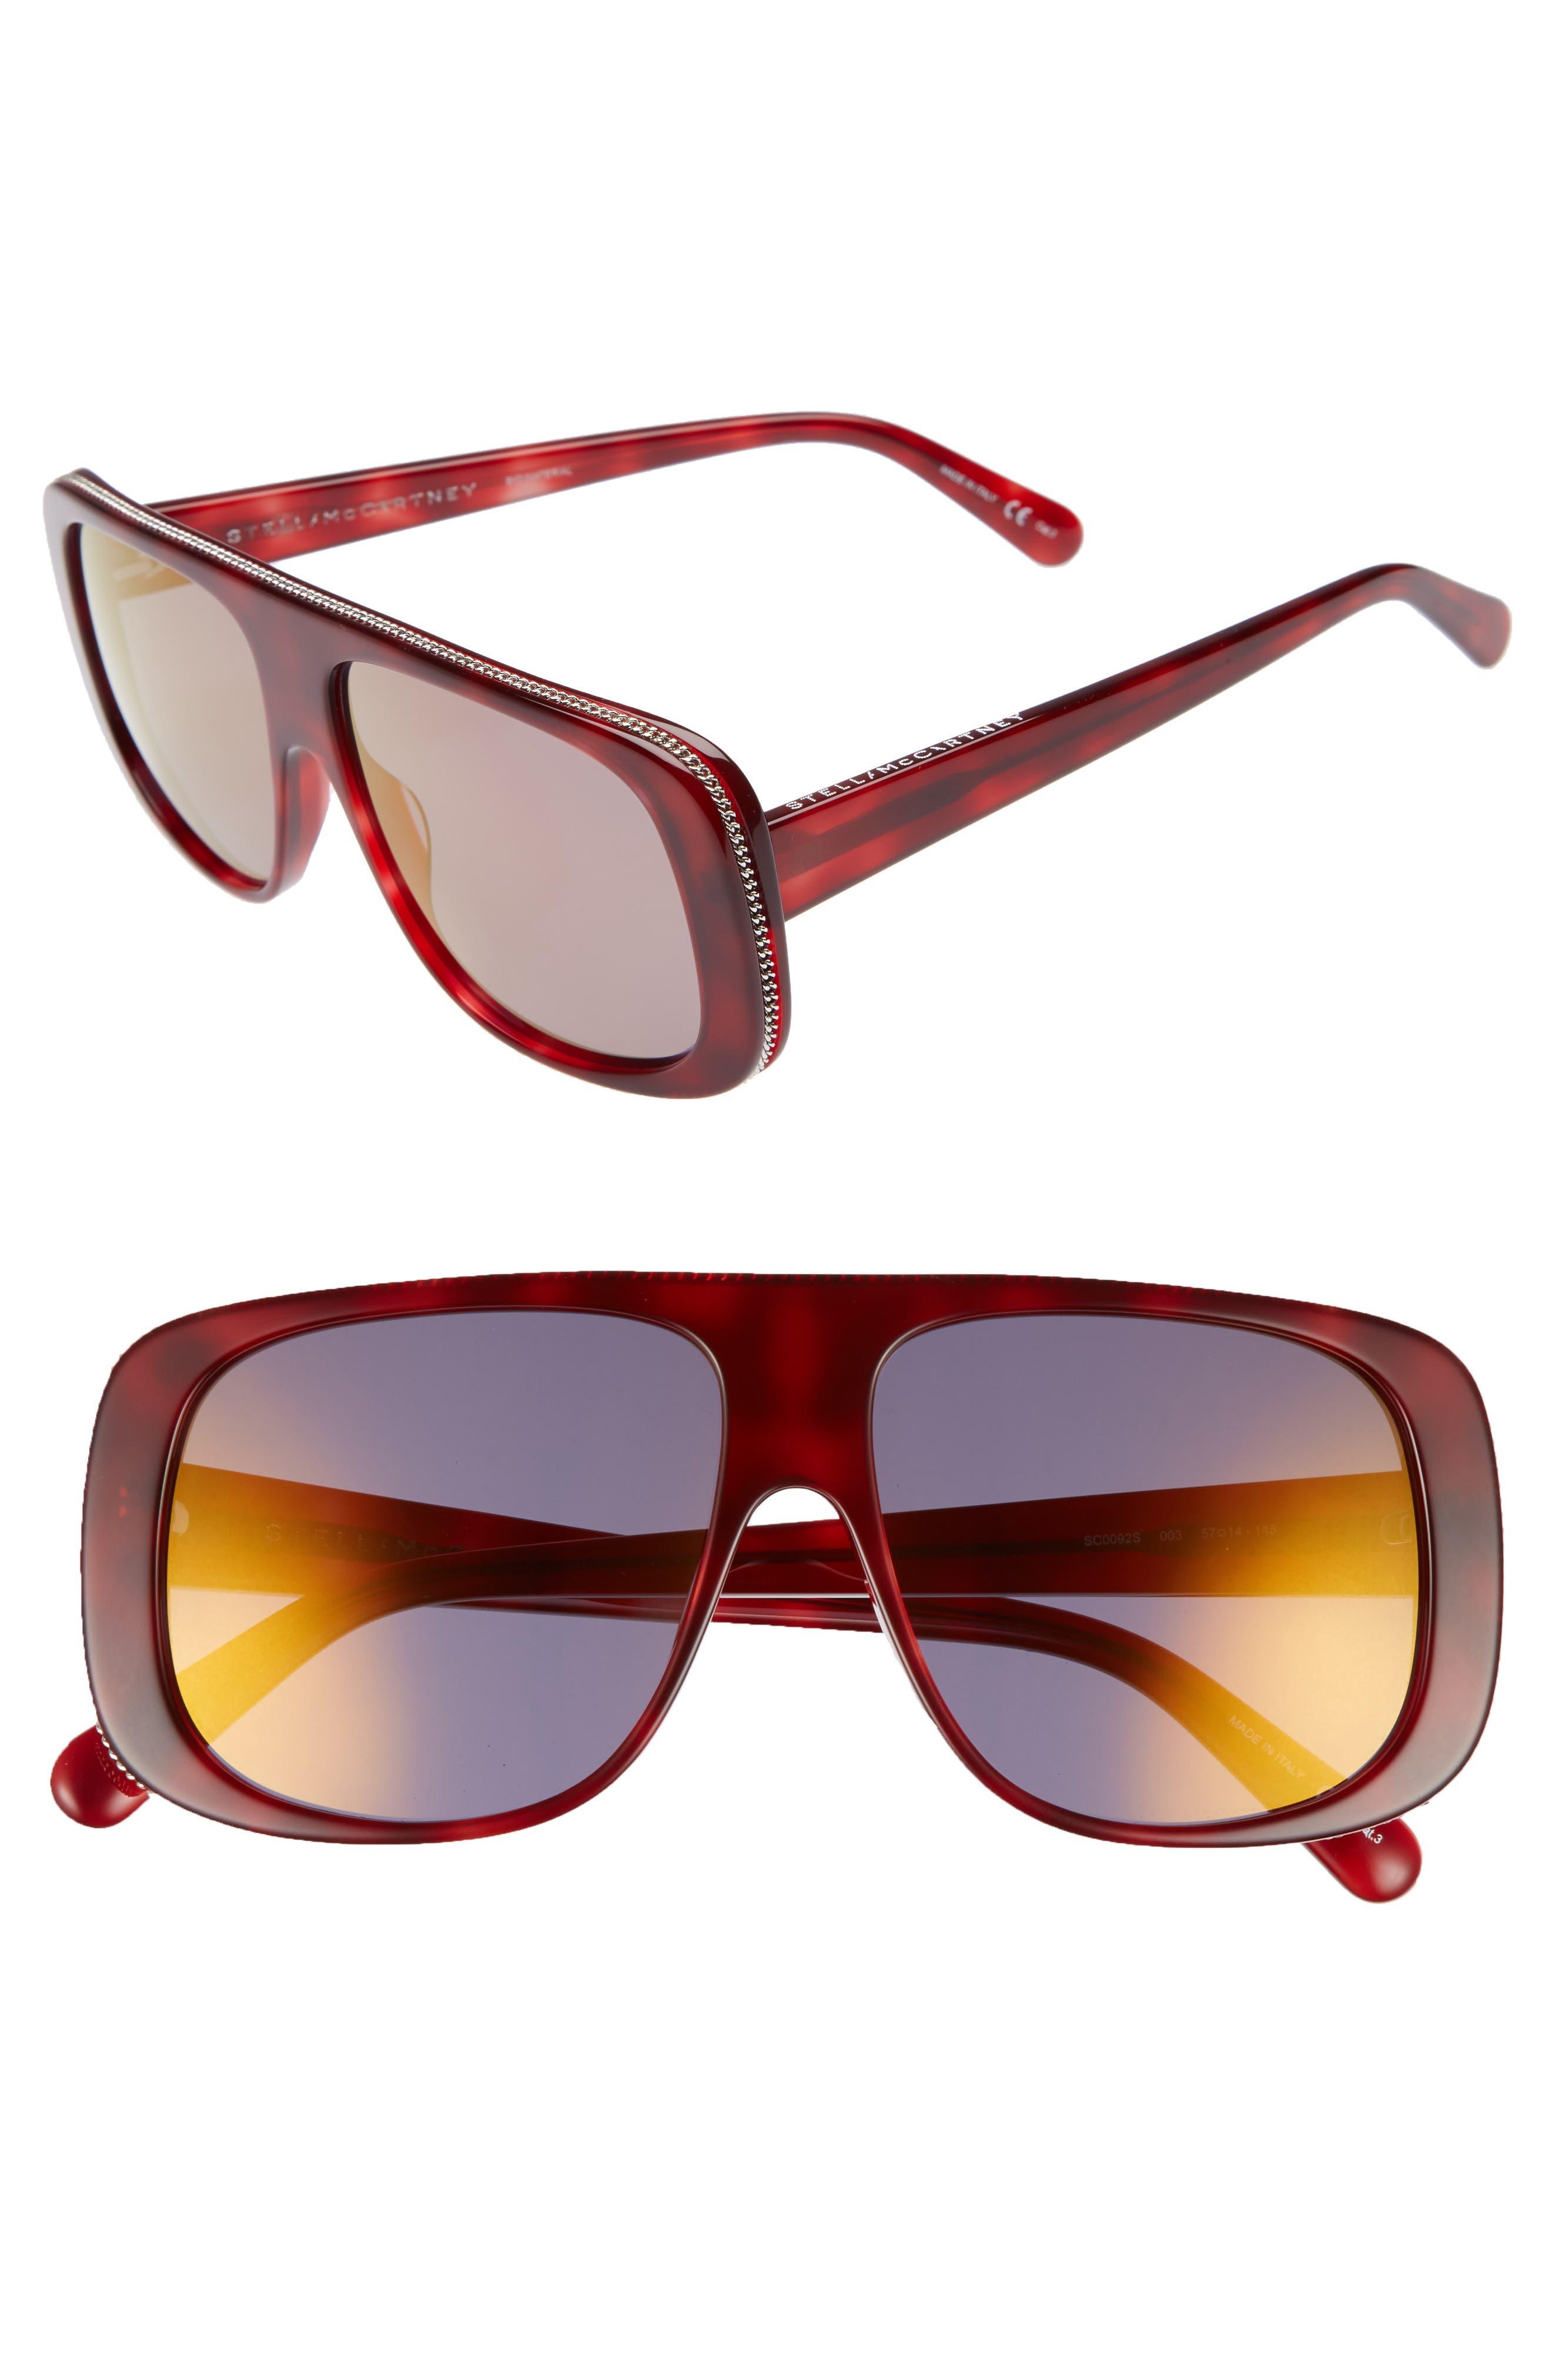 Main Image - Stella McCartney 57mm Flat Top Sunglasses